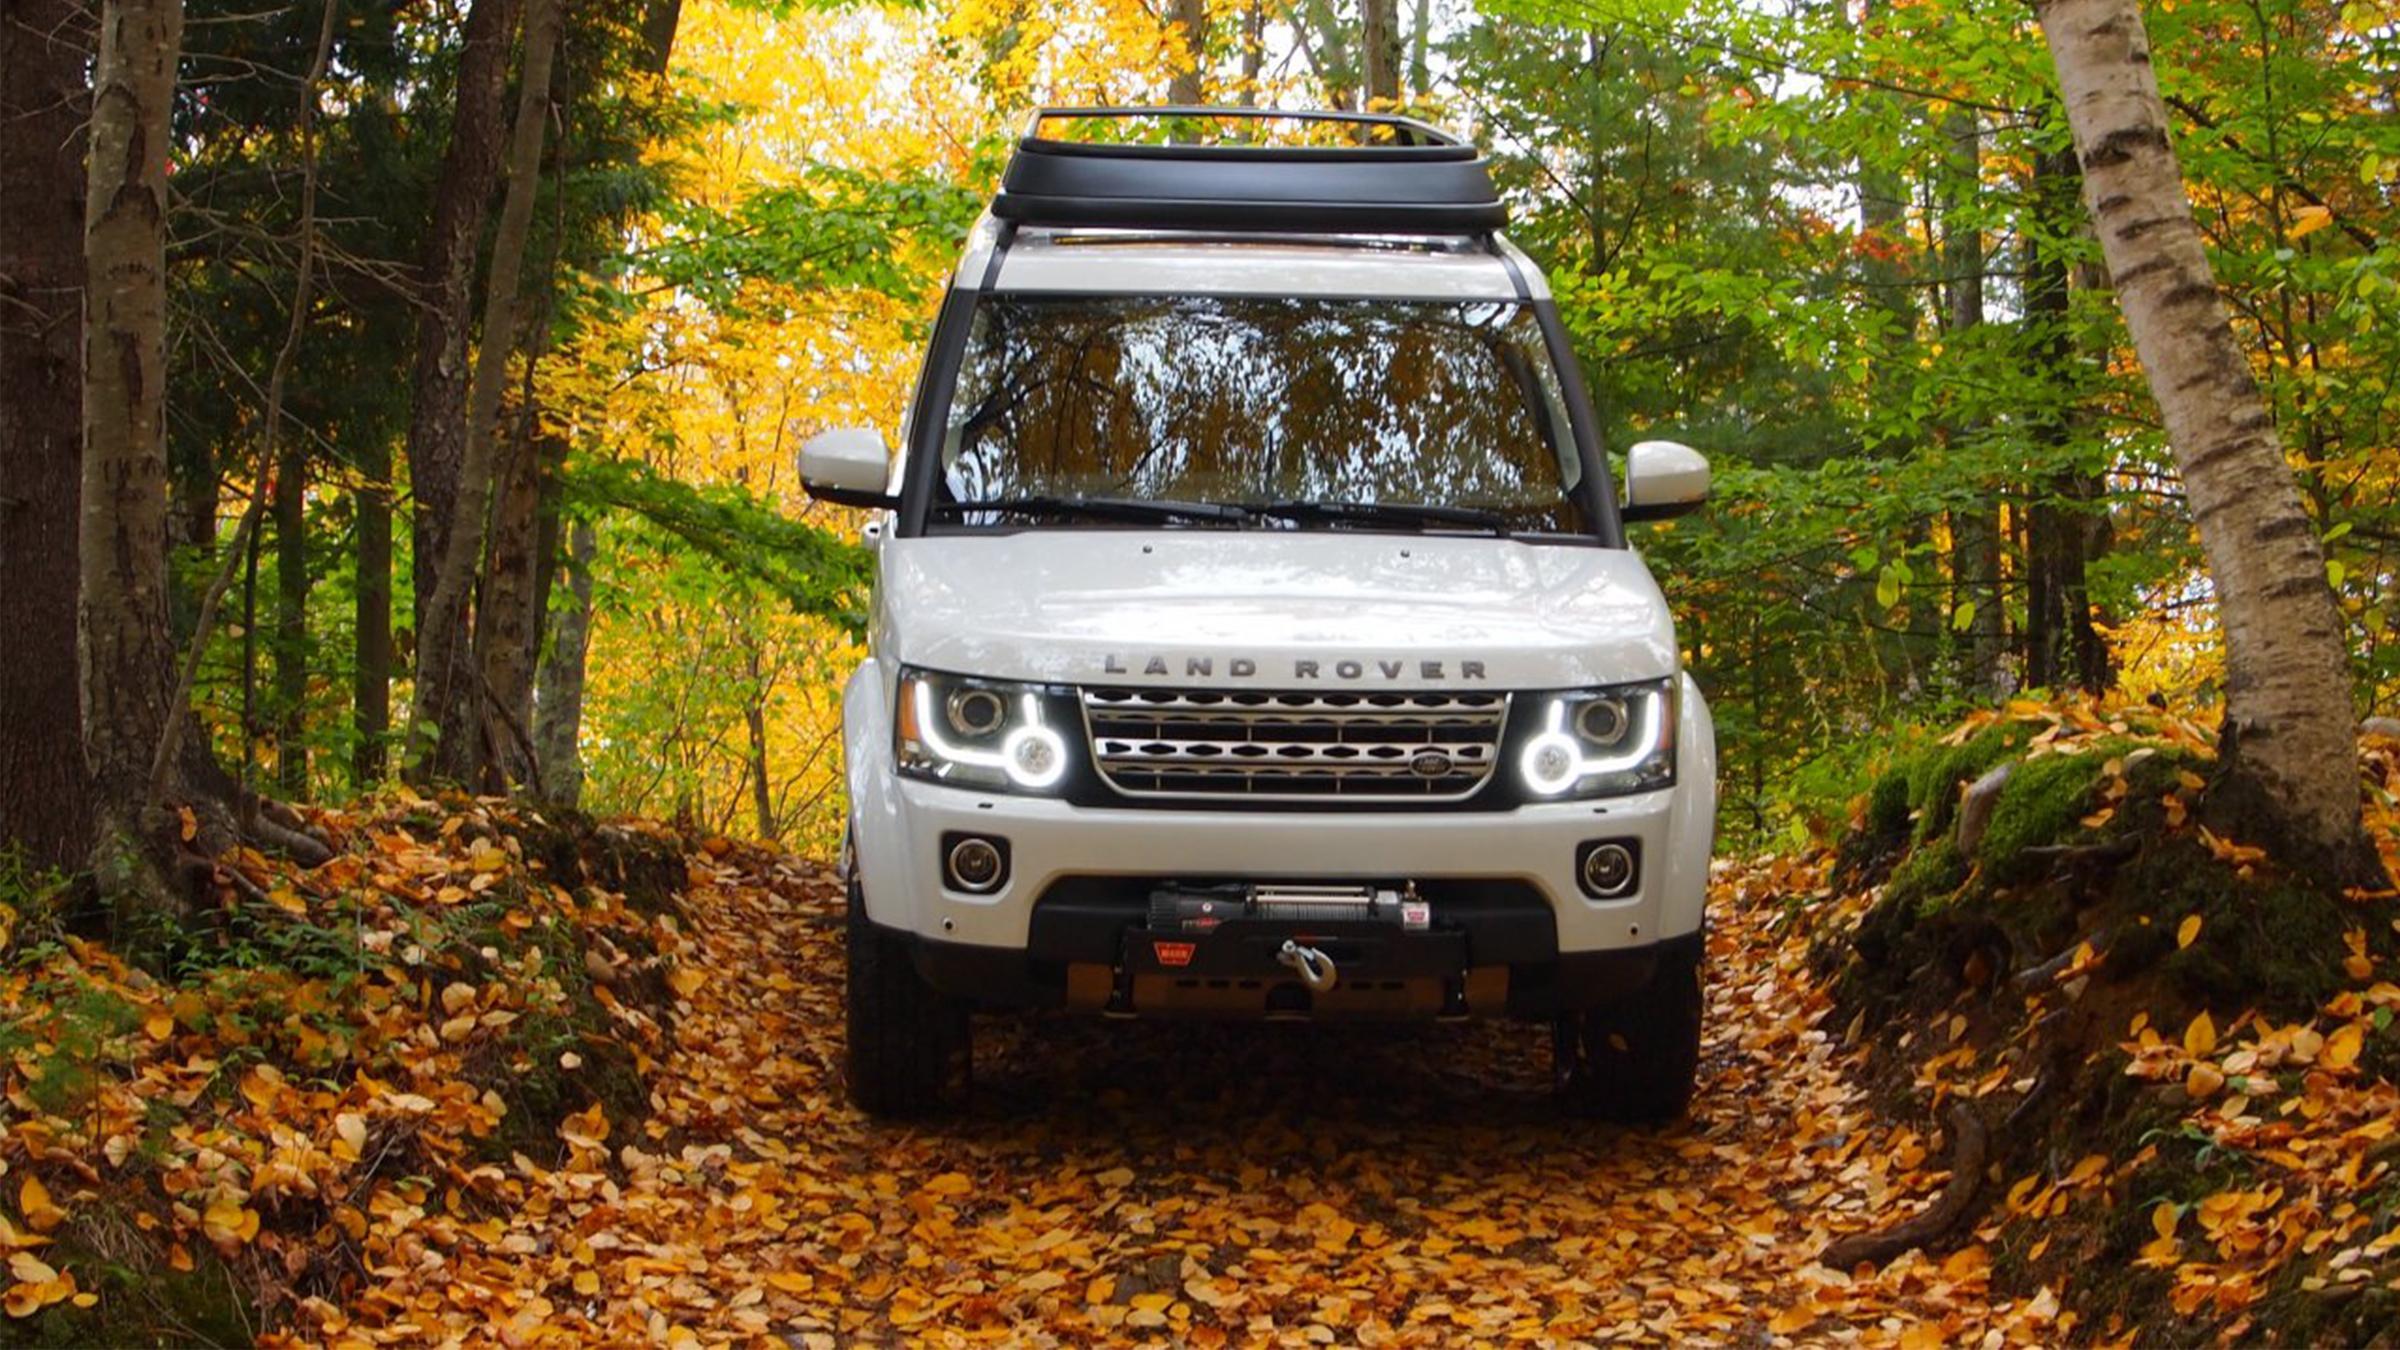 land rover adventure travel - 1280×720